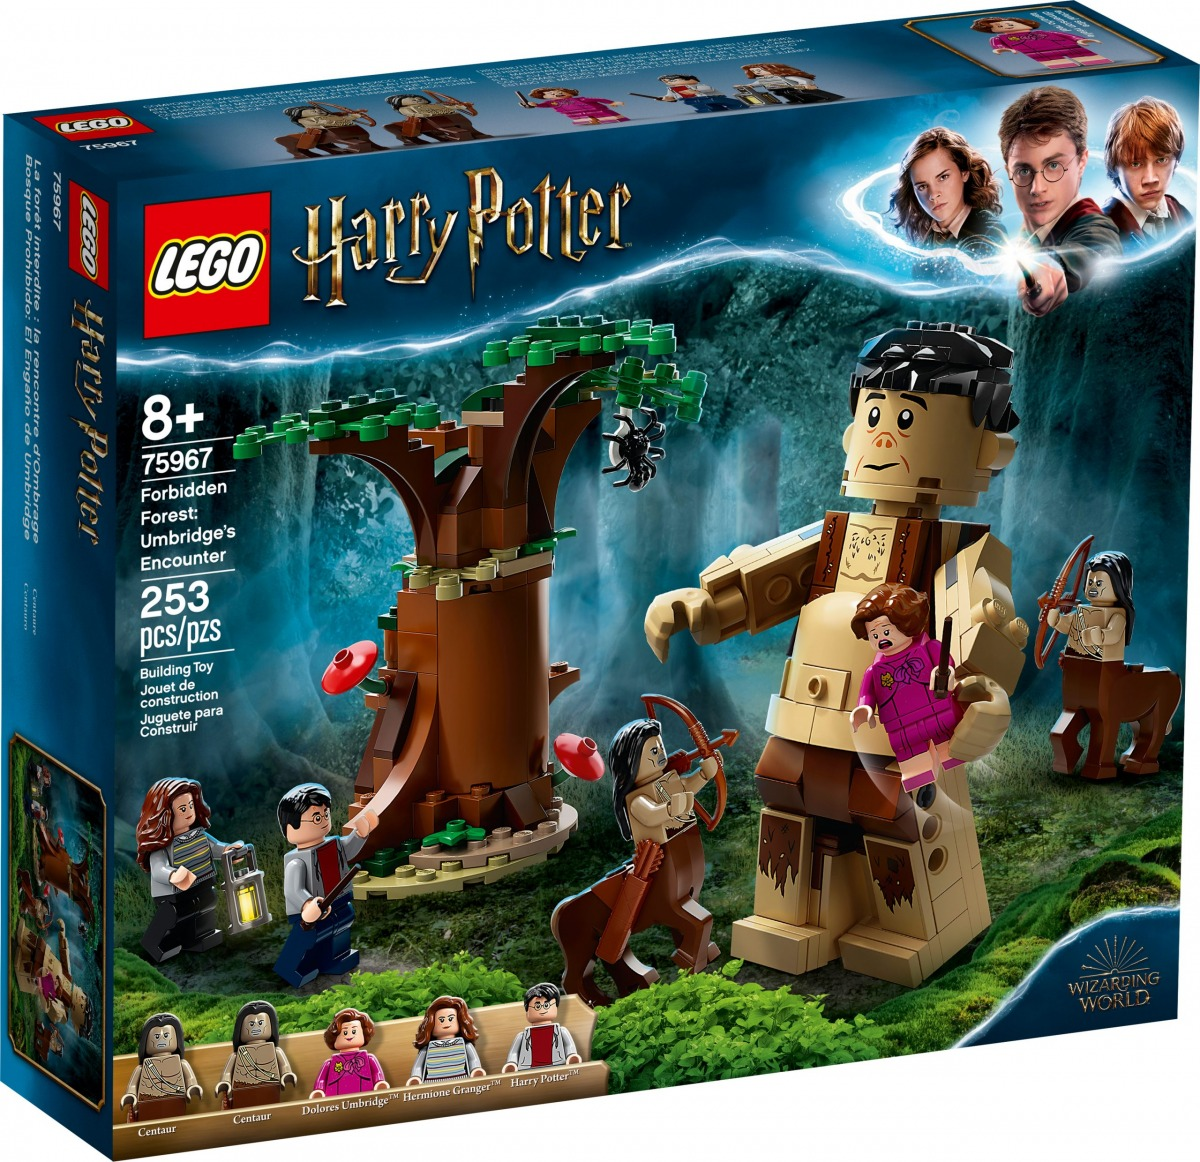 lego 75967 forbidden forest umbridges encounter scaled